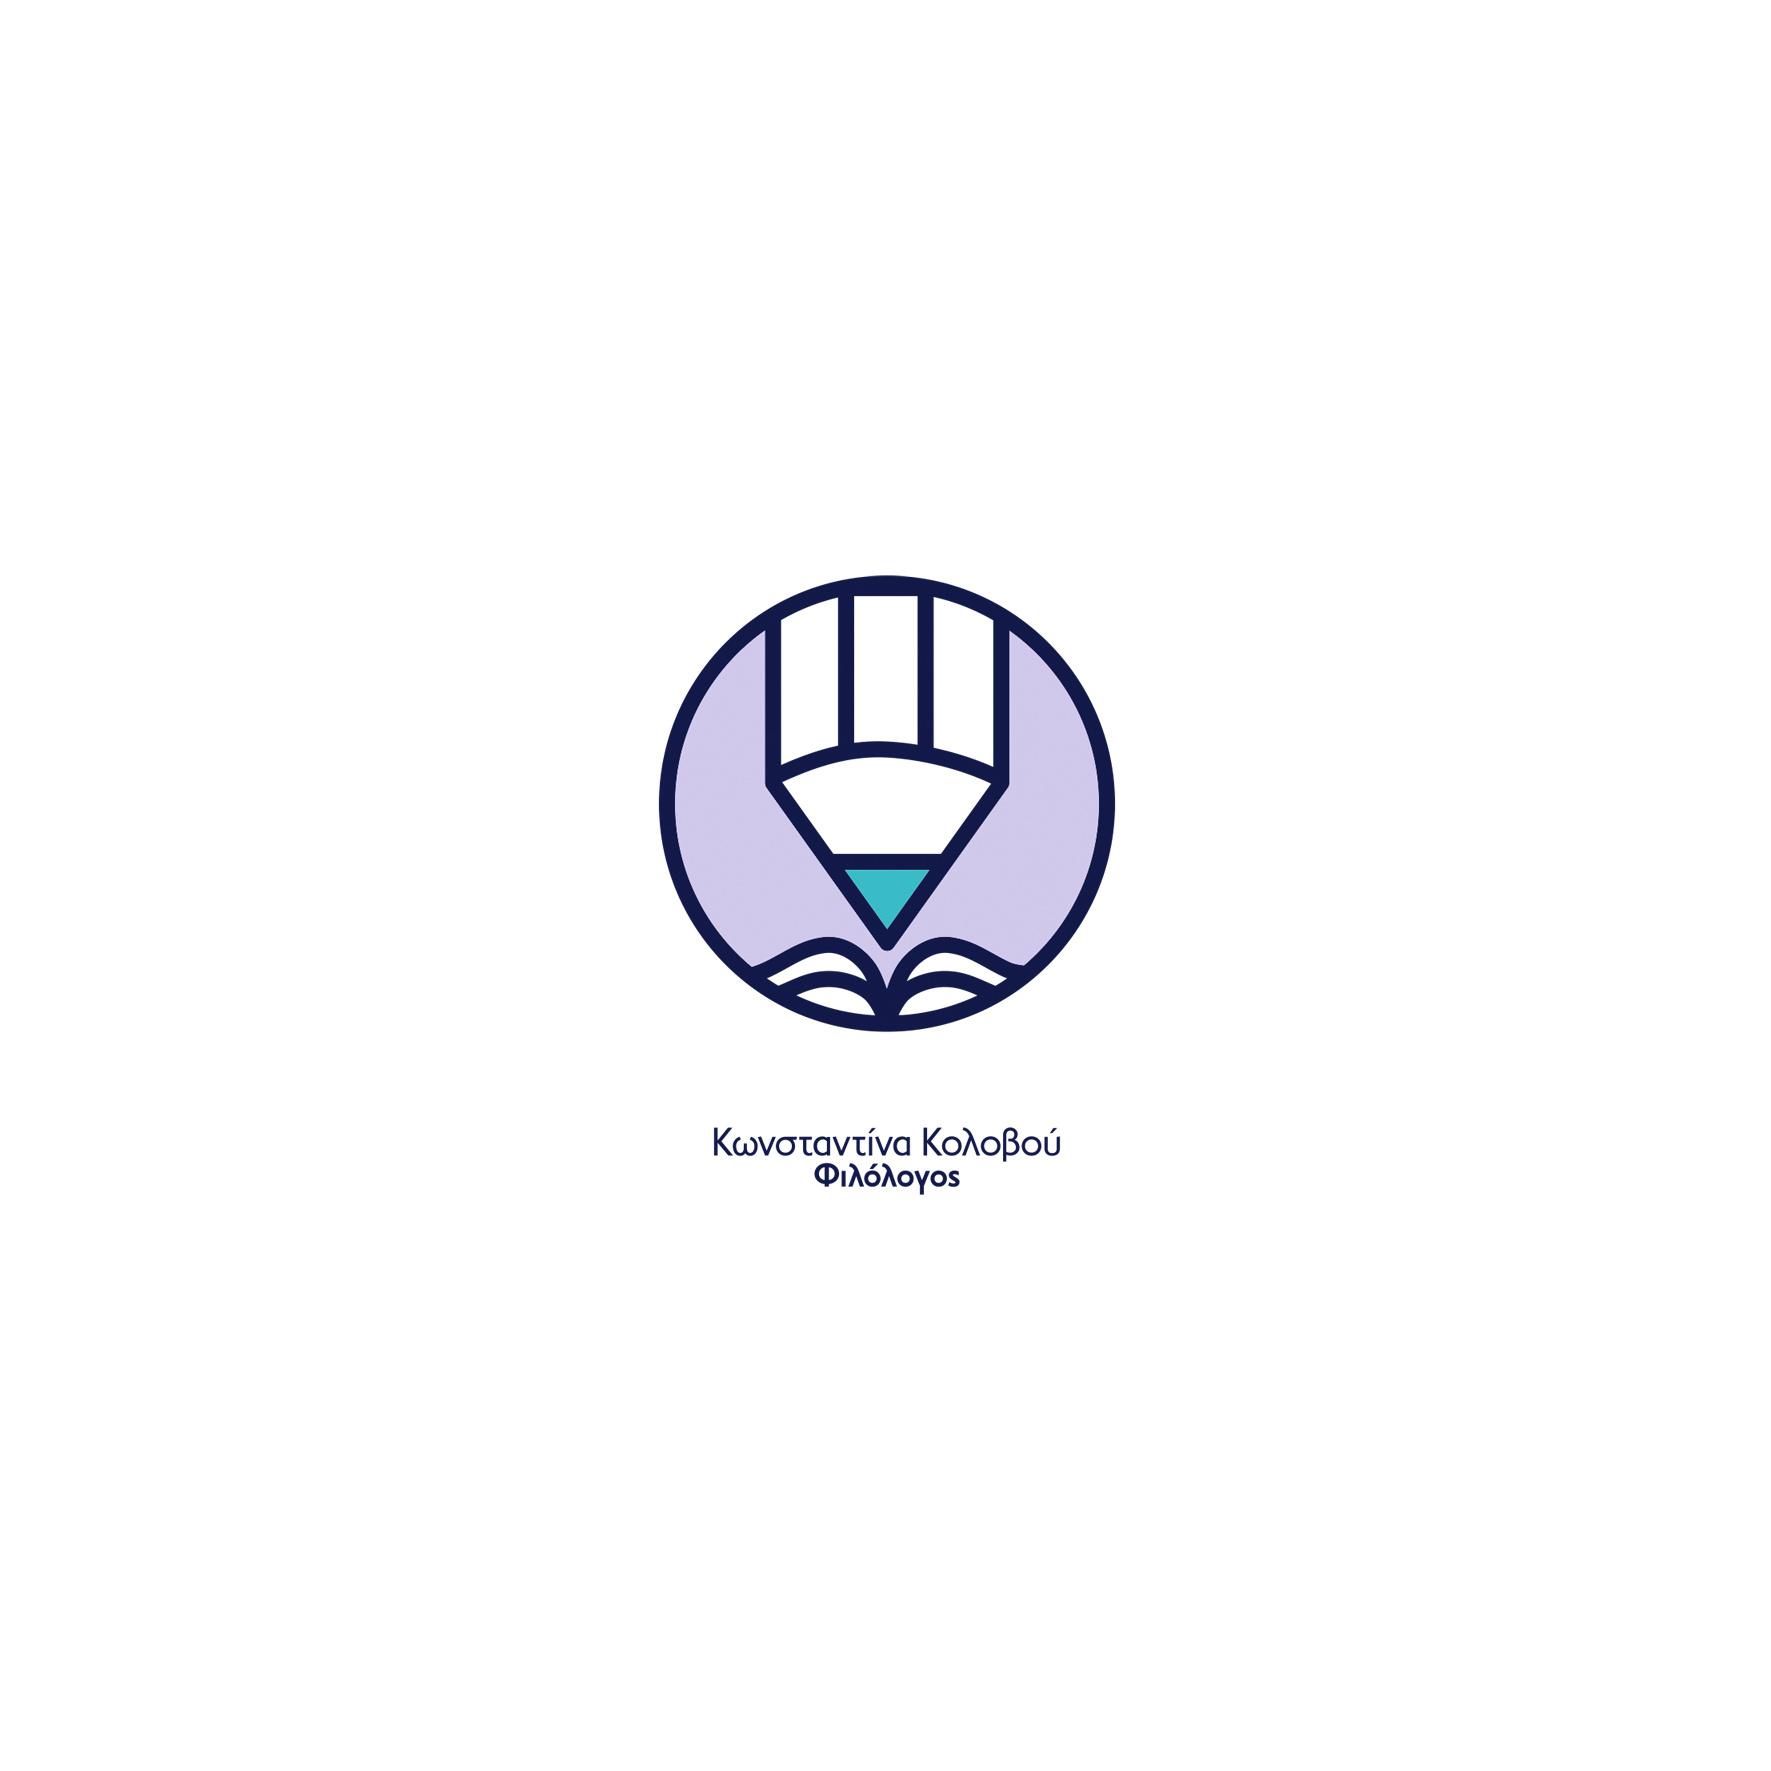 https://0501.nccdn.net/4_2/000/000/06b/a1b/logo-kolovou-by-koukida-1771x1771.jpg